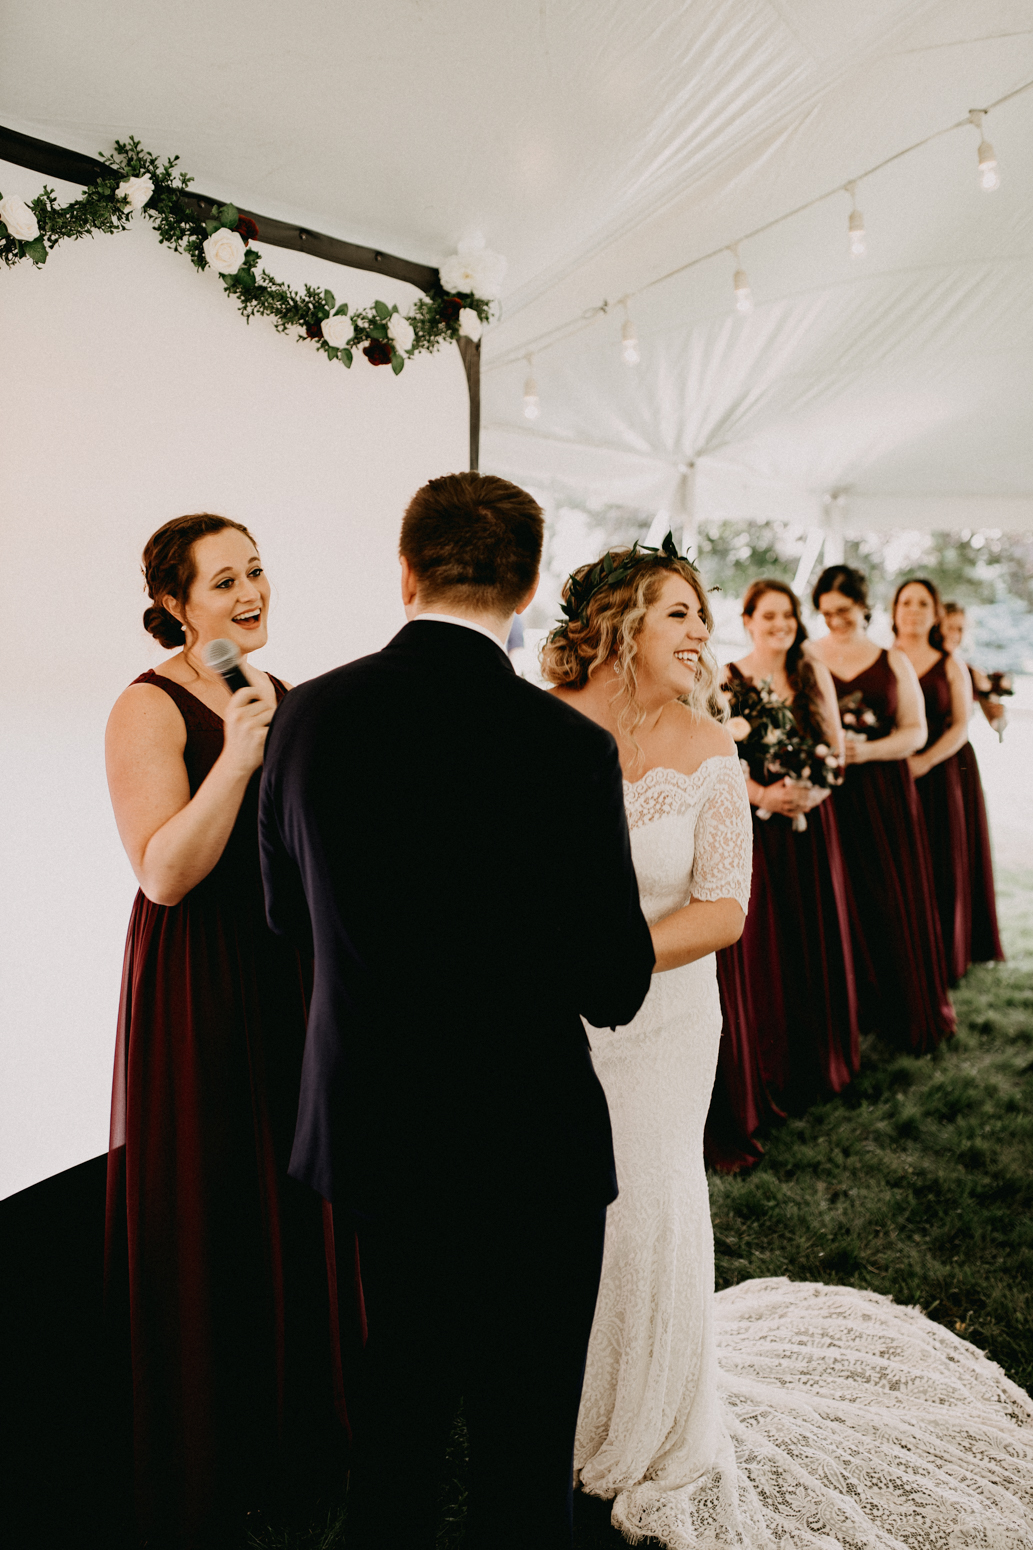 Rochester, NY Wedding Photographer (74 of 149).jpg